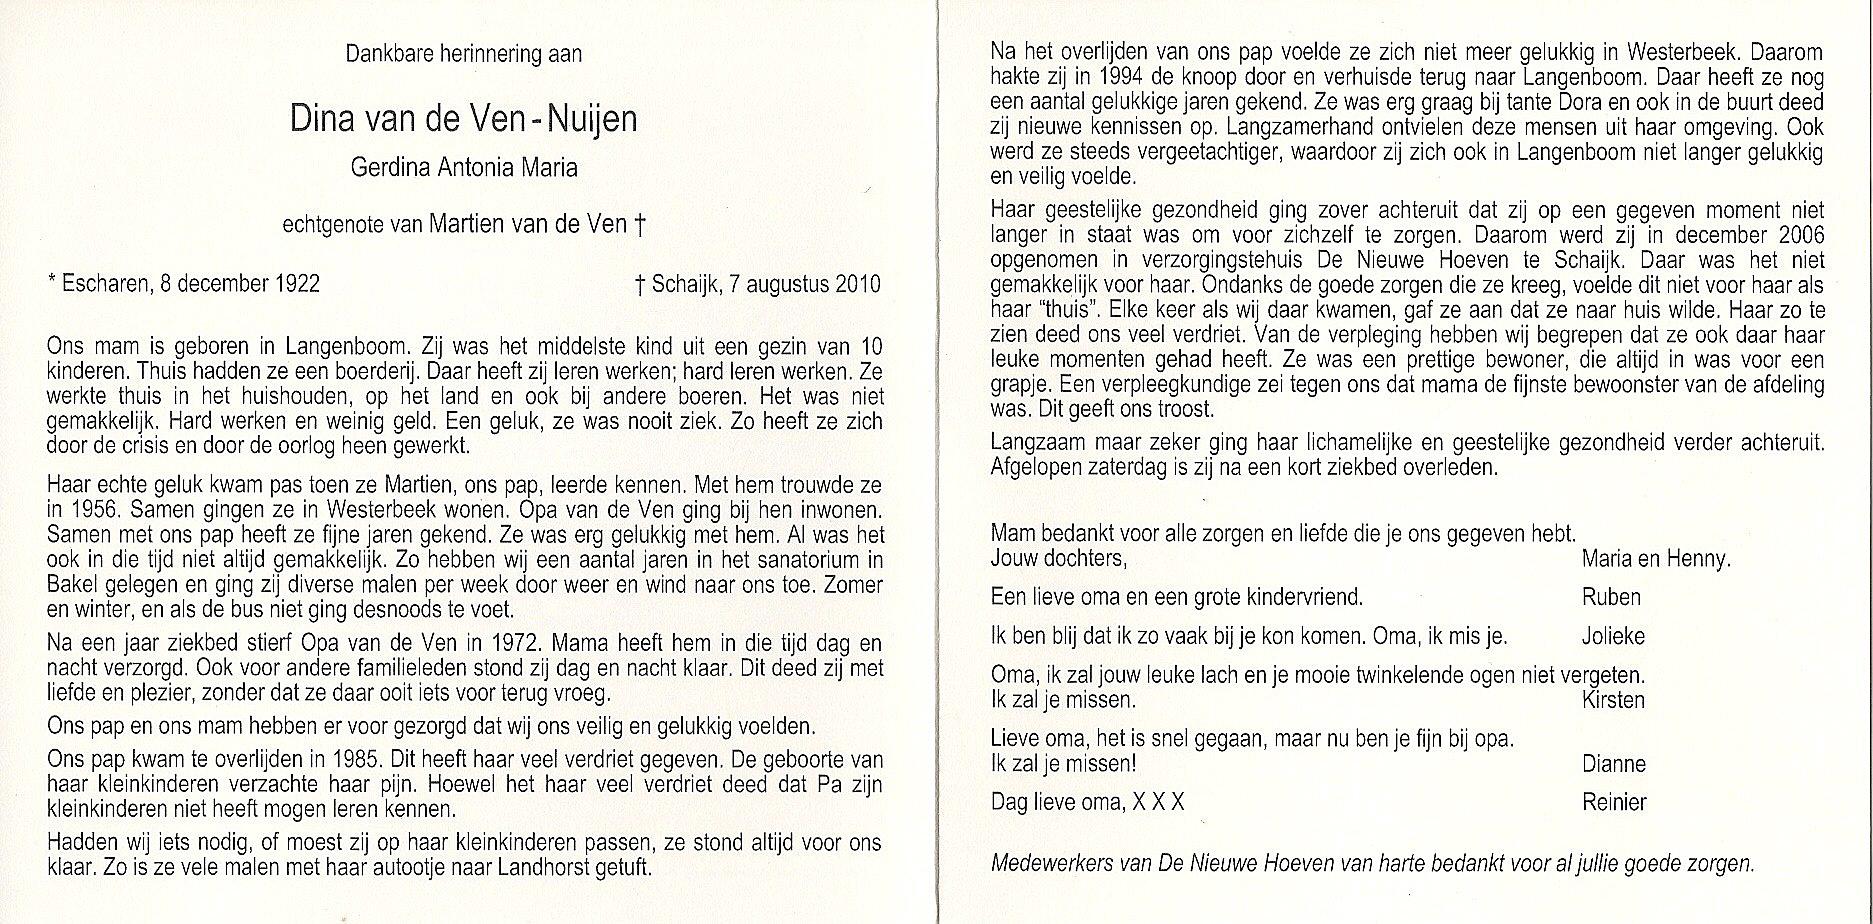 Bidprentje Gerdina Antonia MariaNuijen